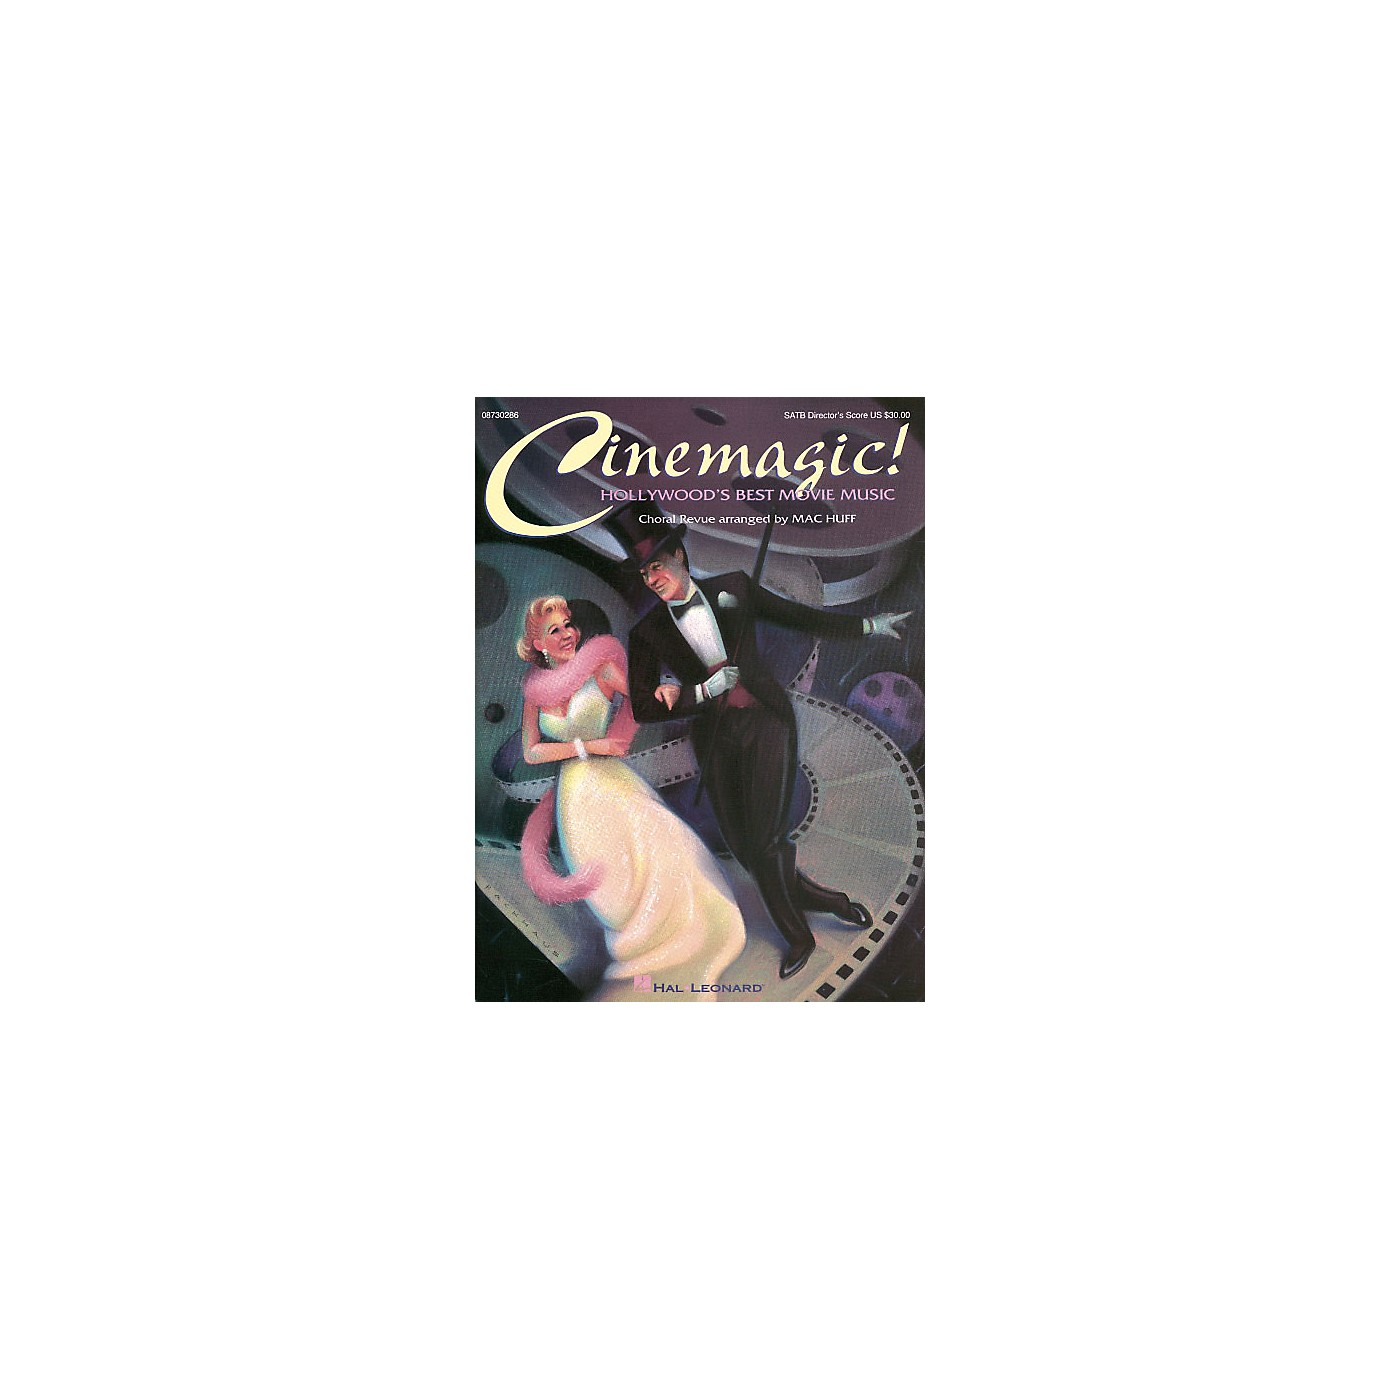 Hal Leonard Cinemagic! - Hollywood's Best Movie Music (Medley) SATB Score arranged by Mac Huff thumbnail